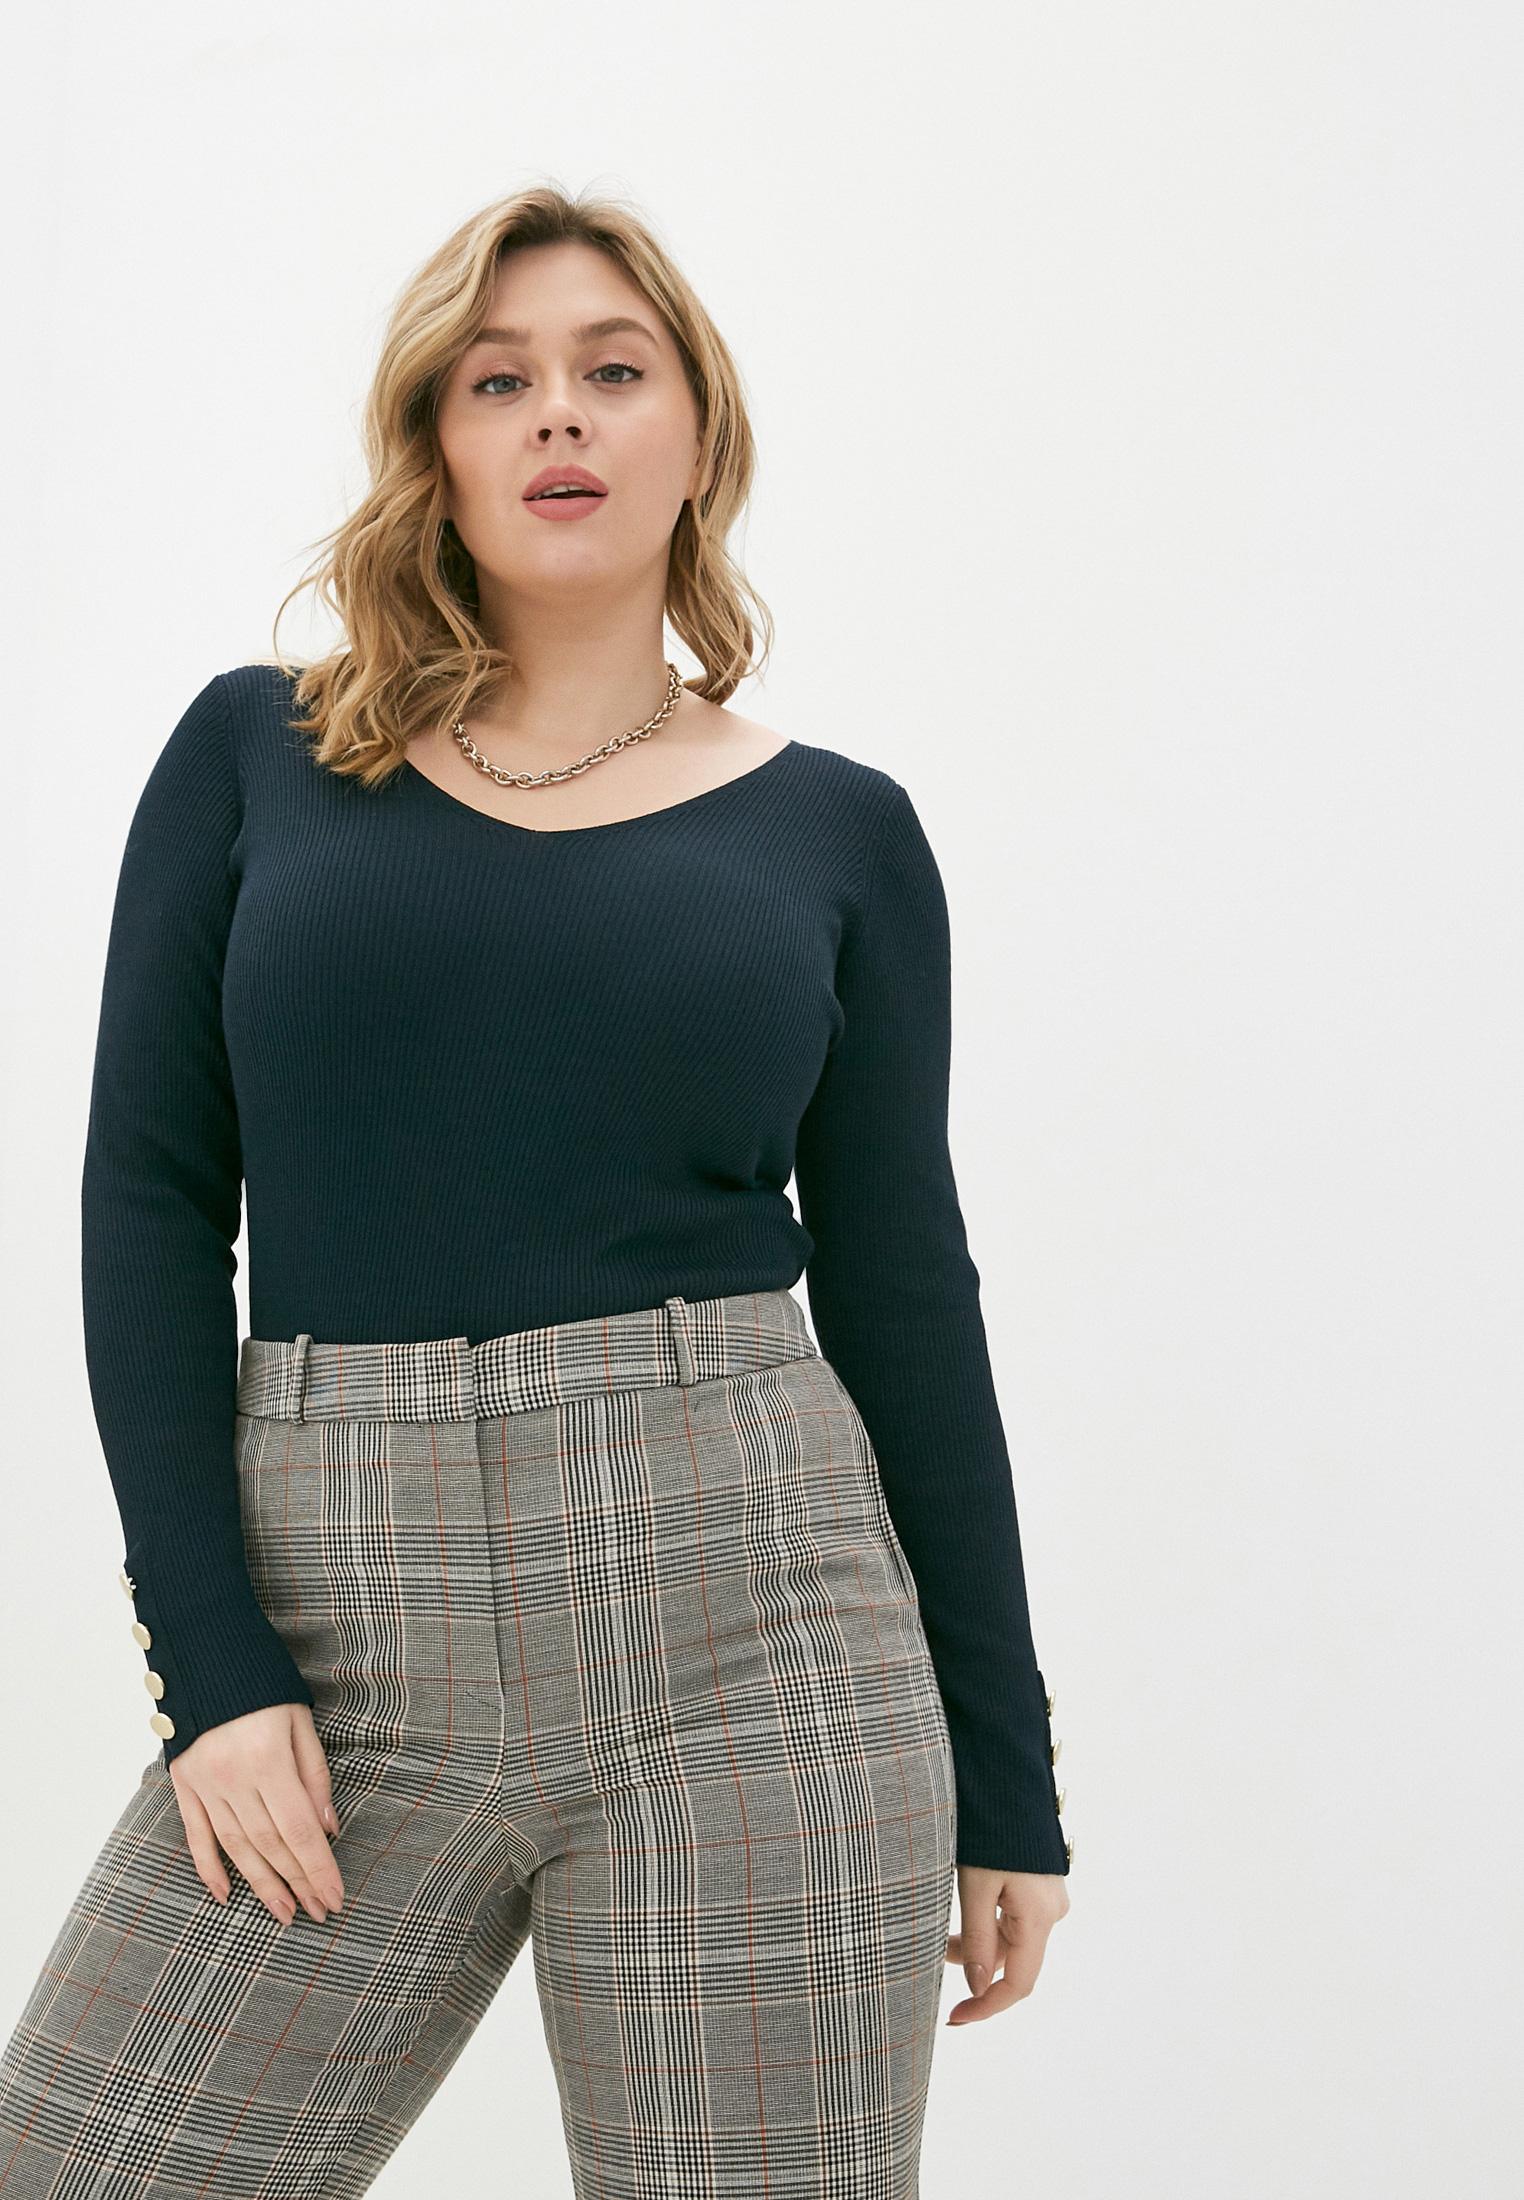 Пуловер Jacqueline de Yong Пуловер Jacqueline de Yong